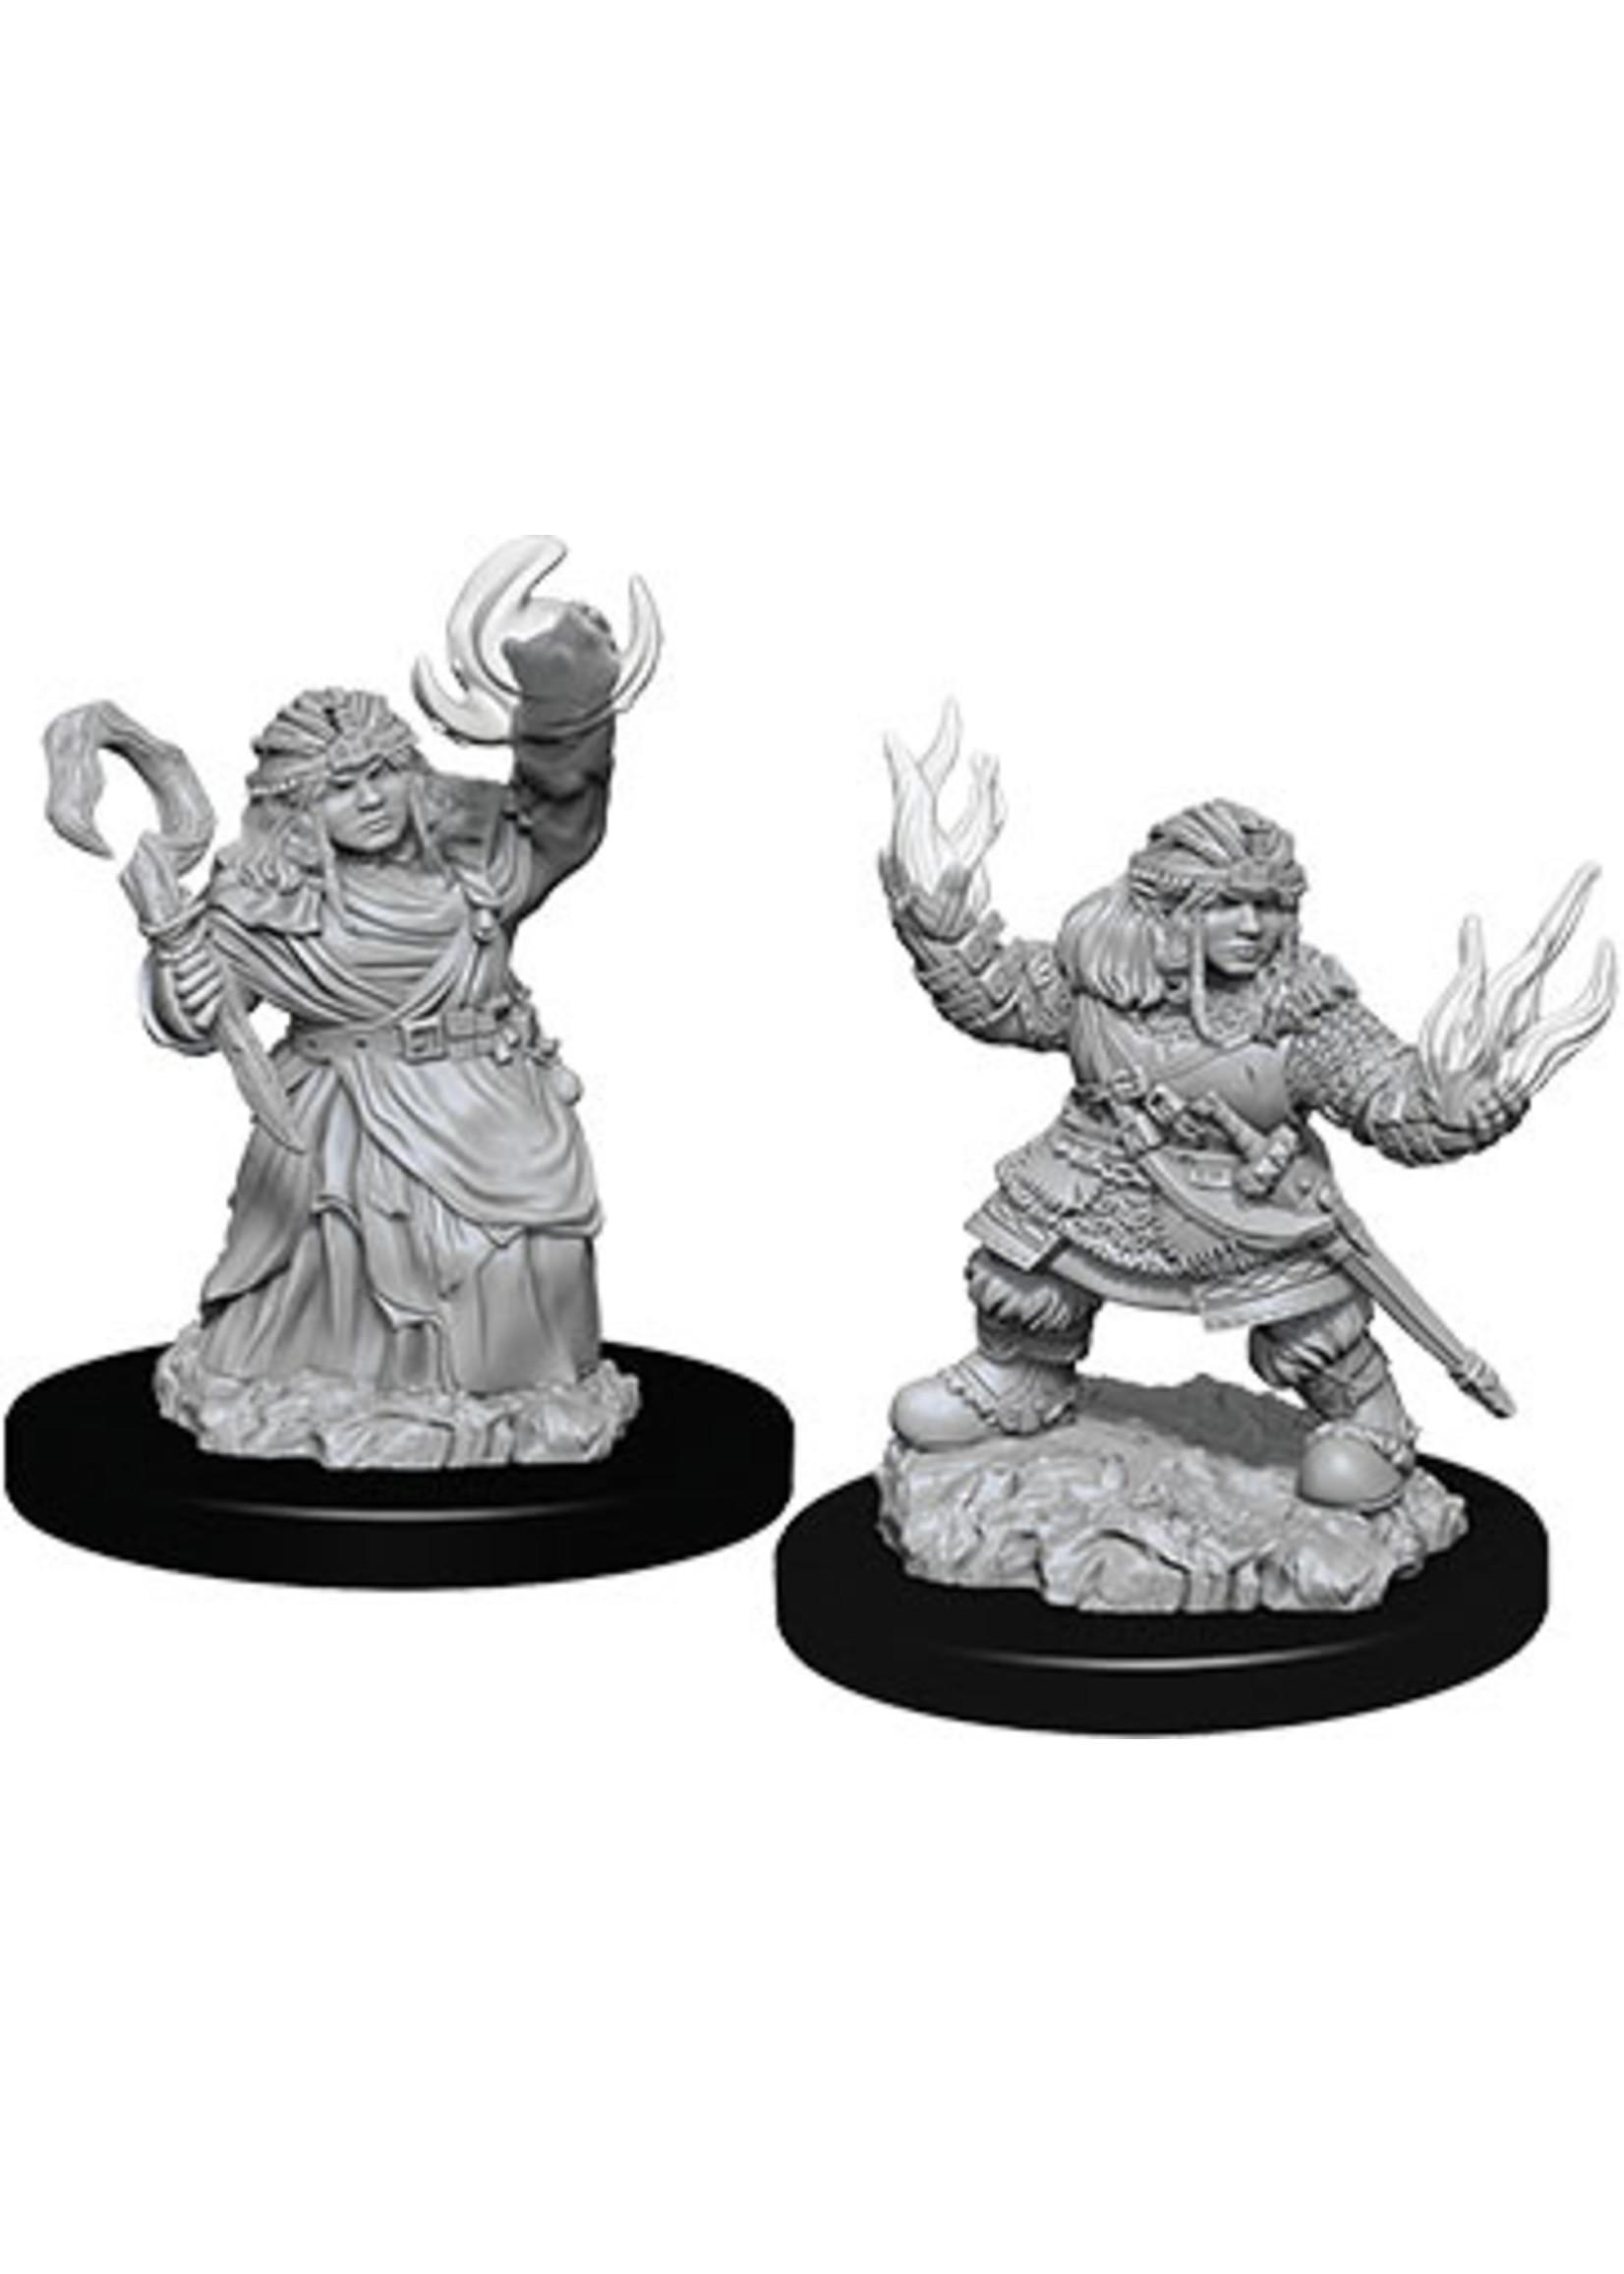 Pathfinder Deep Cuts Unpainted Miniatures: W7 Female Dwarf Summoner